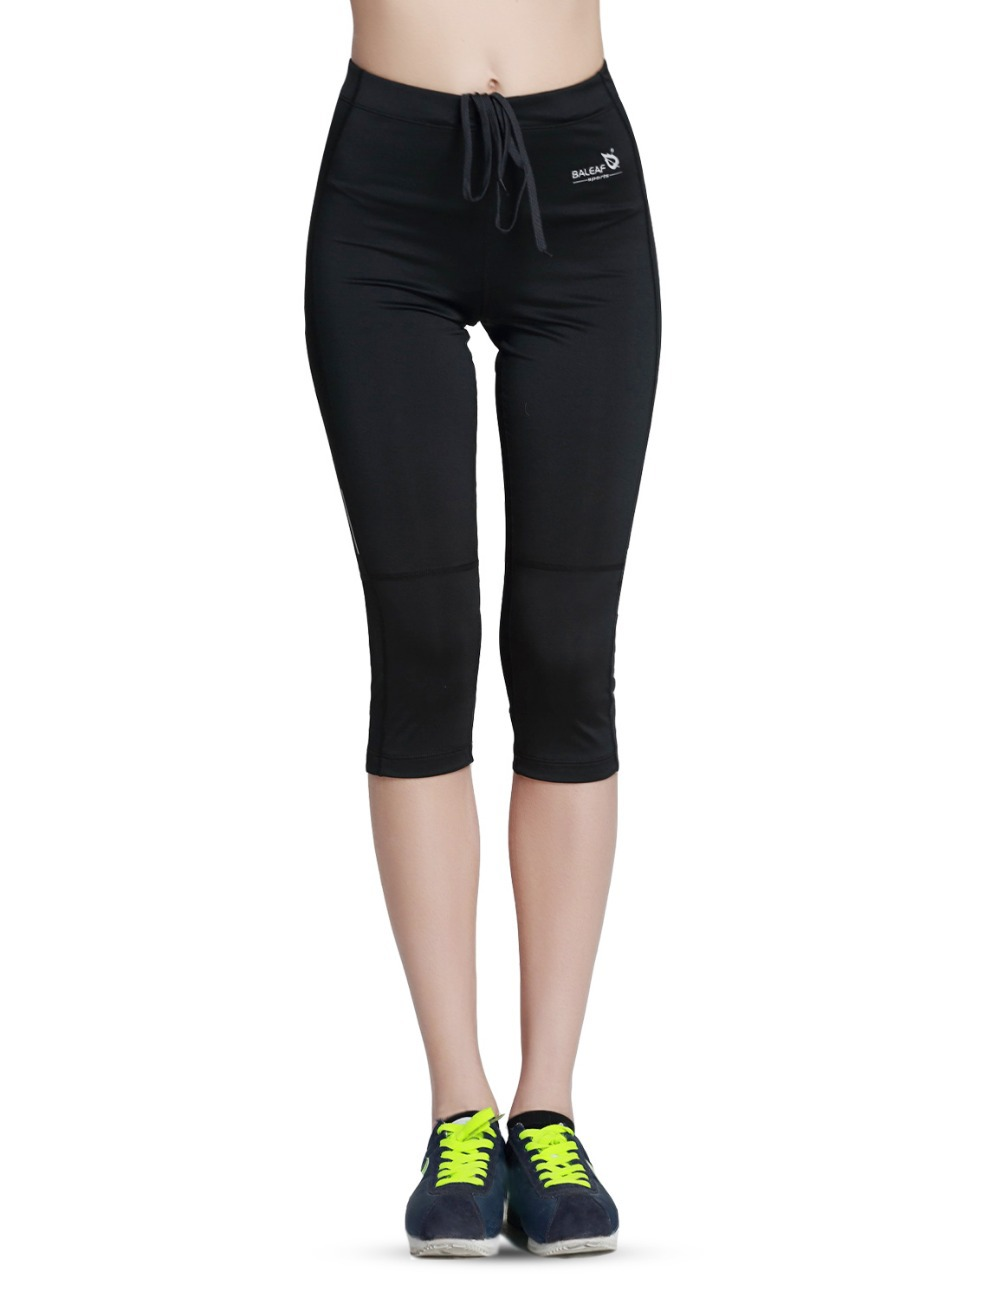 Capri Fitness